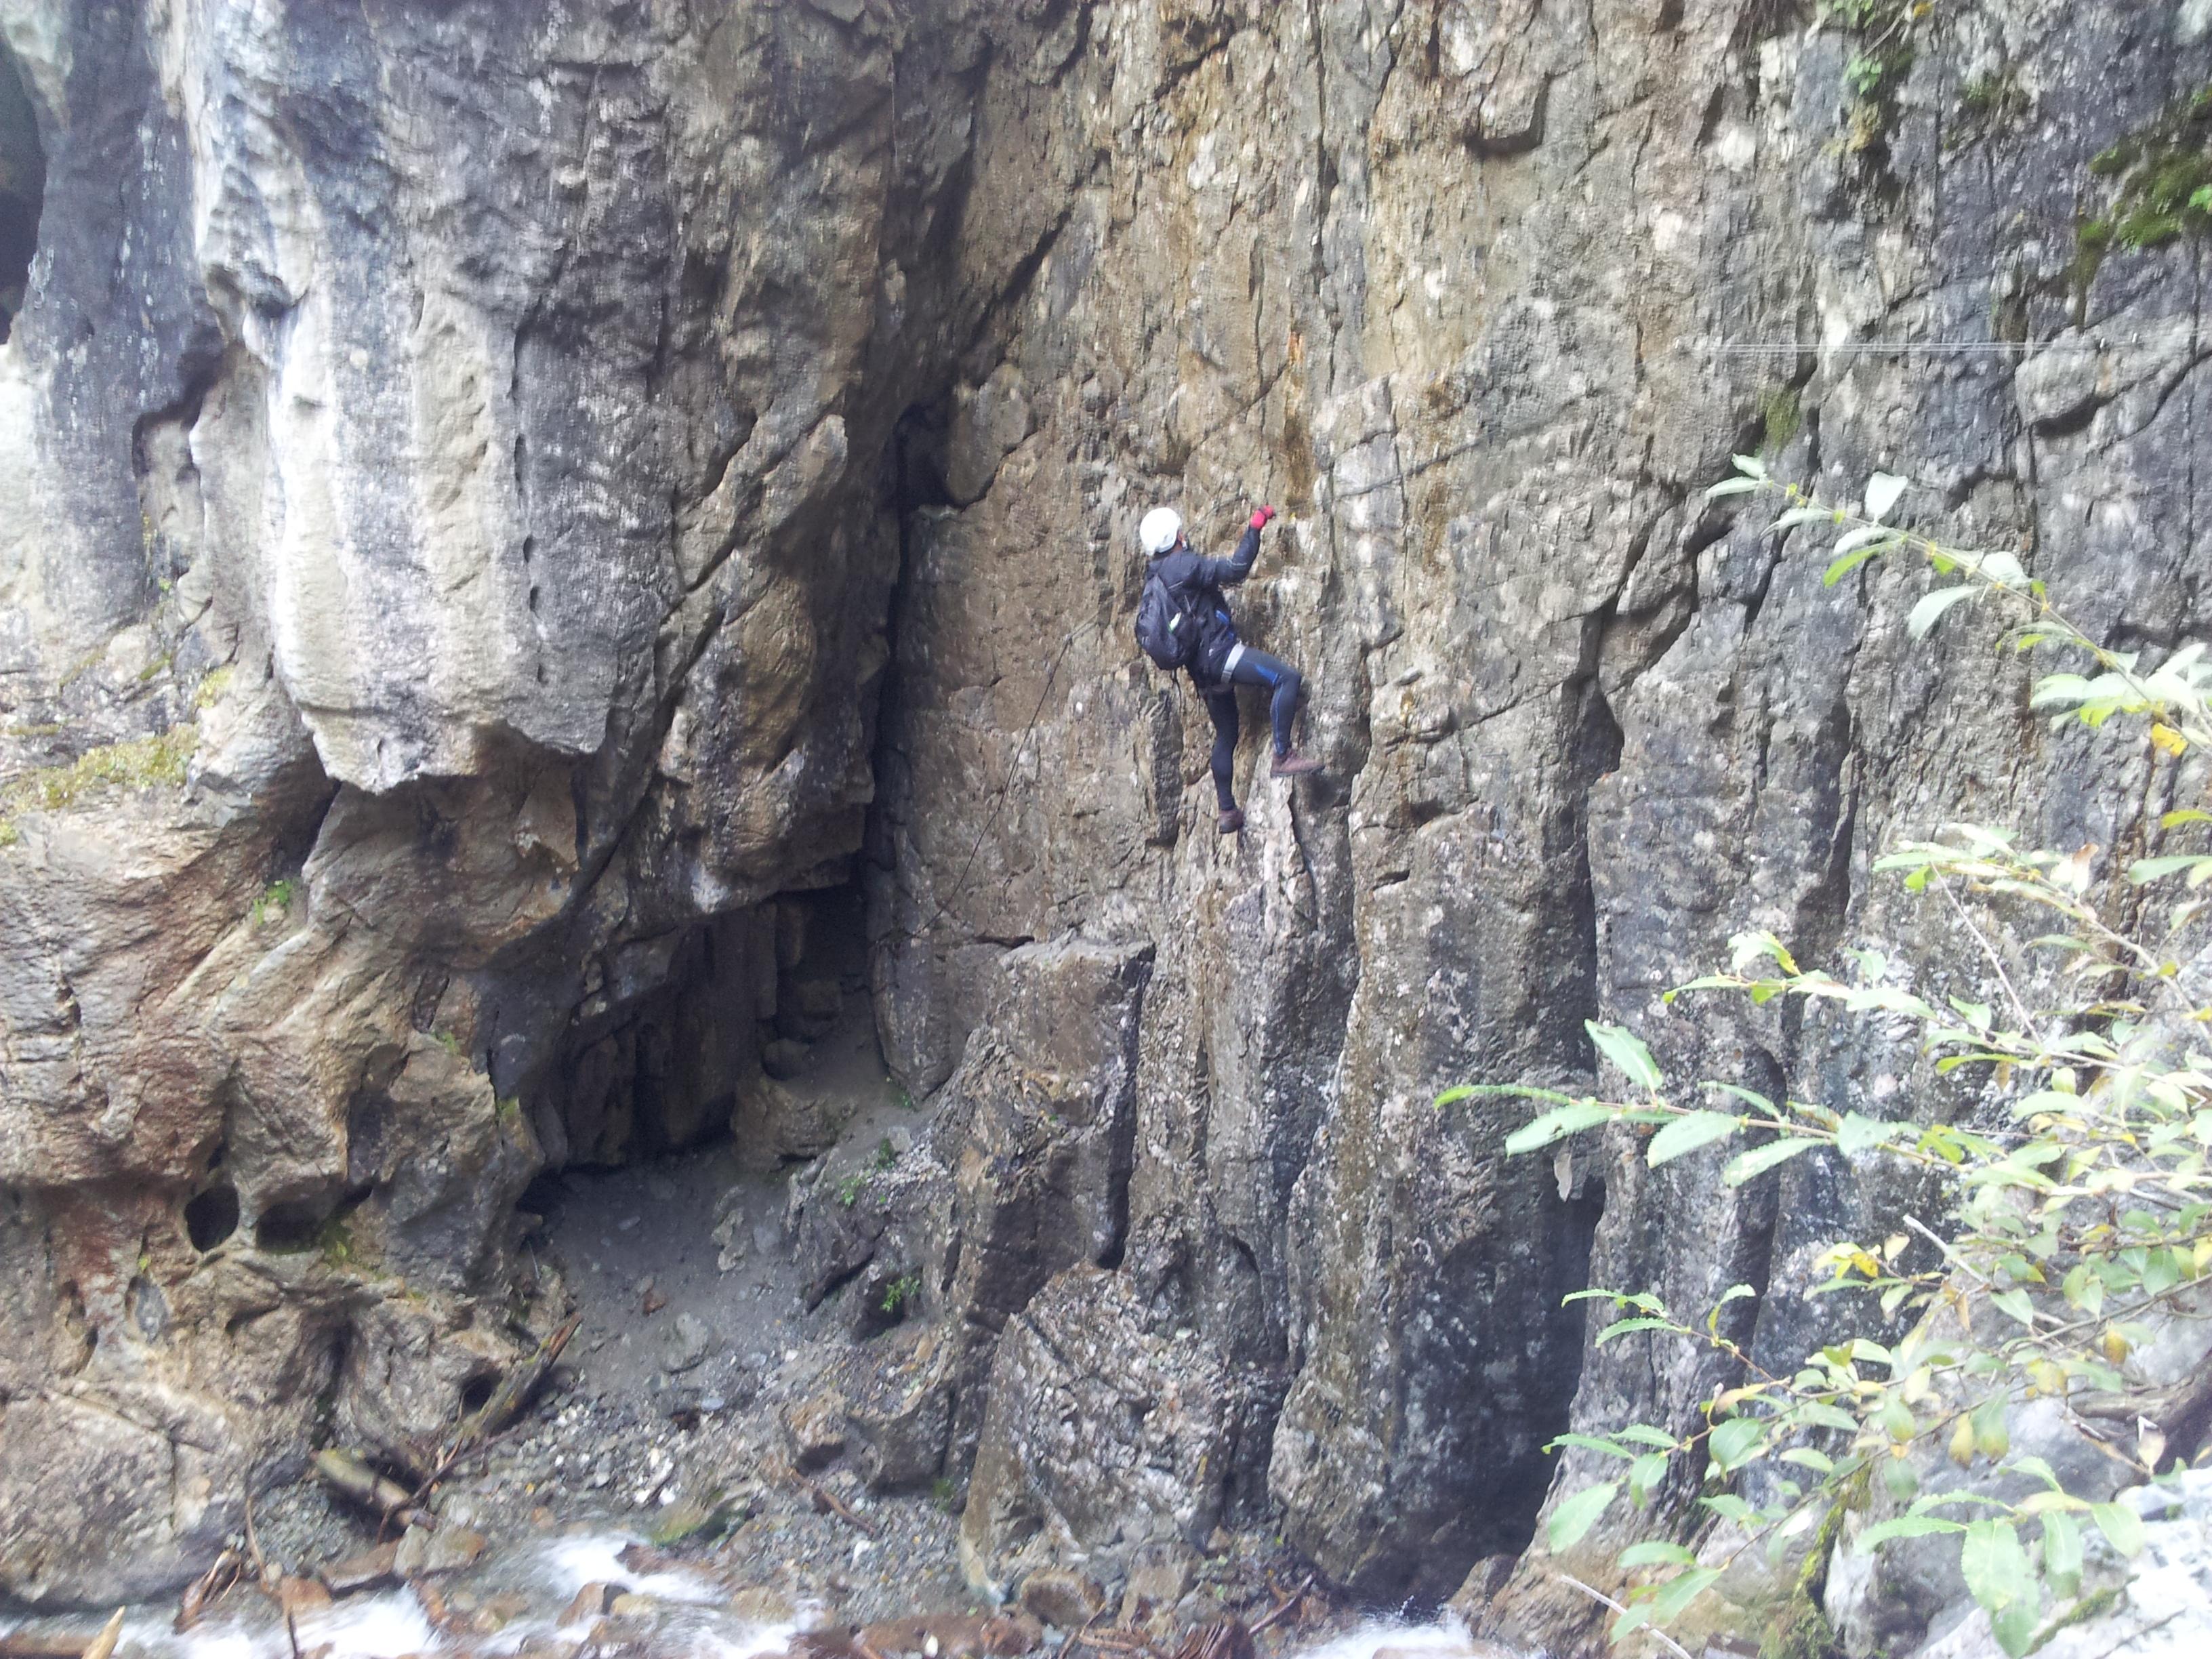 Klettersteig Montafon : Klettersteige im montafon lisa unterwegs